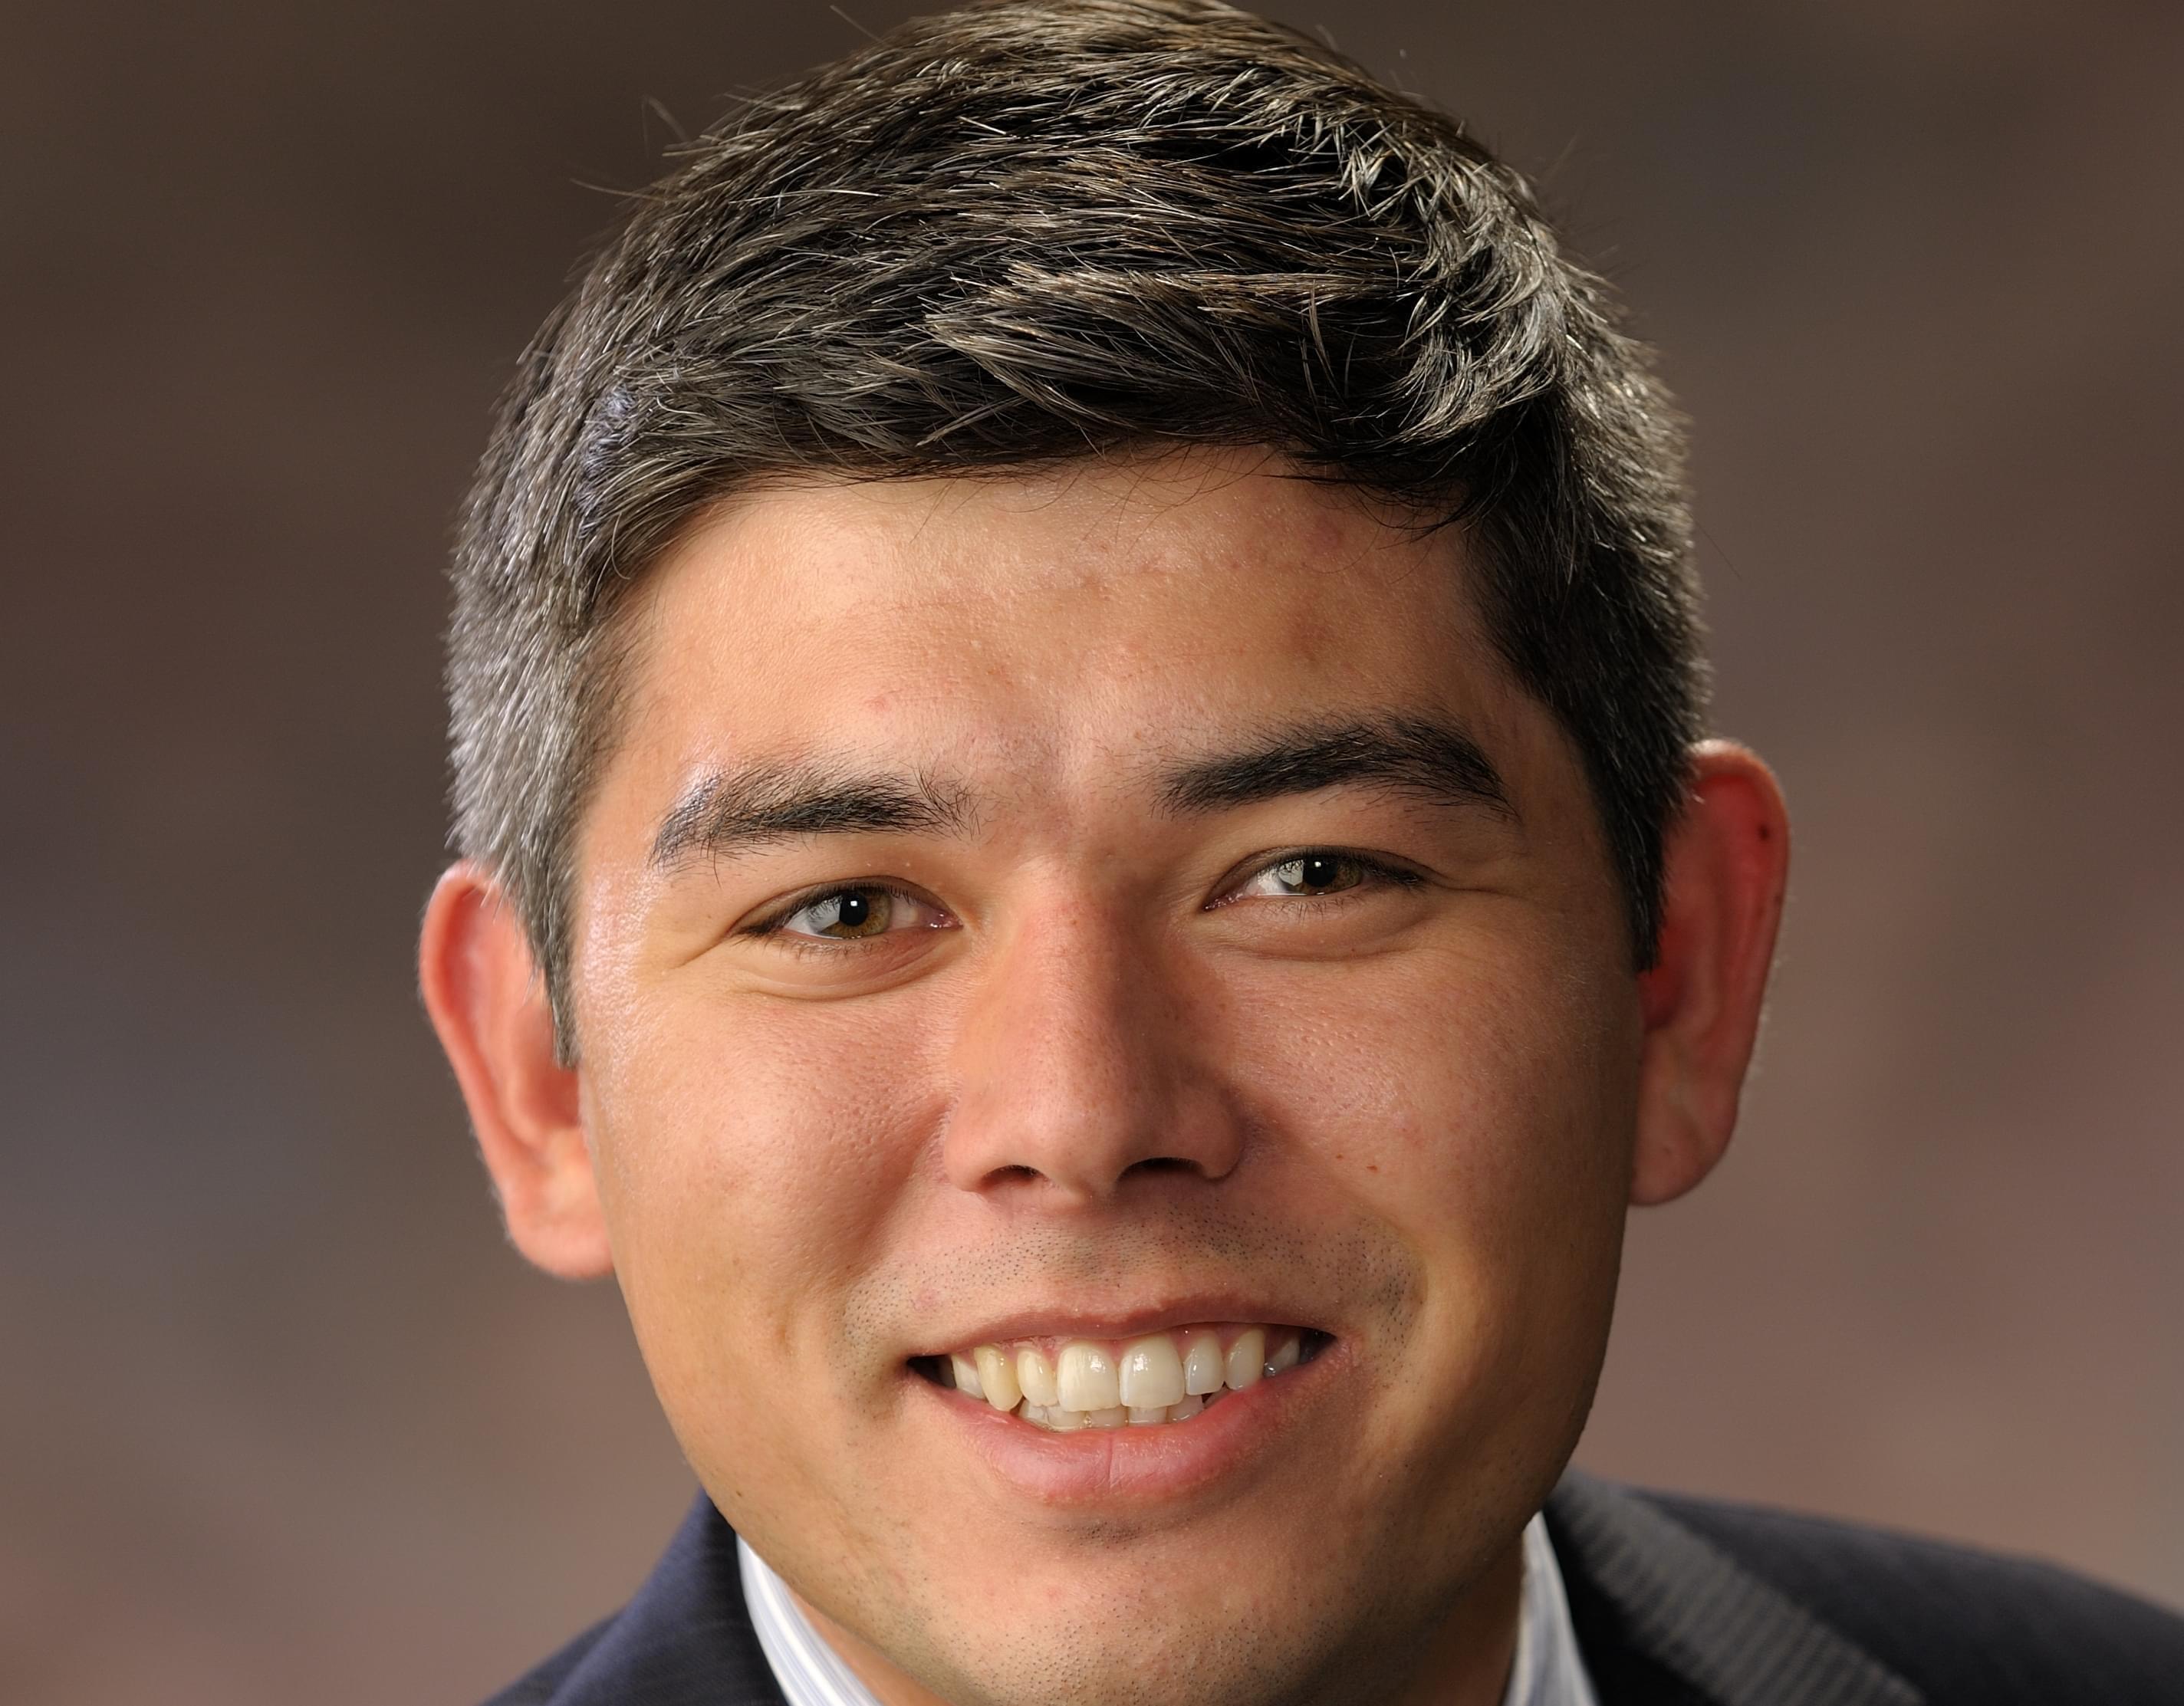 Busey Wealth Management Vice-President and Investment Portfolio Manager Thaddeus Yasunaga.